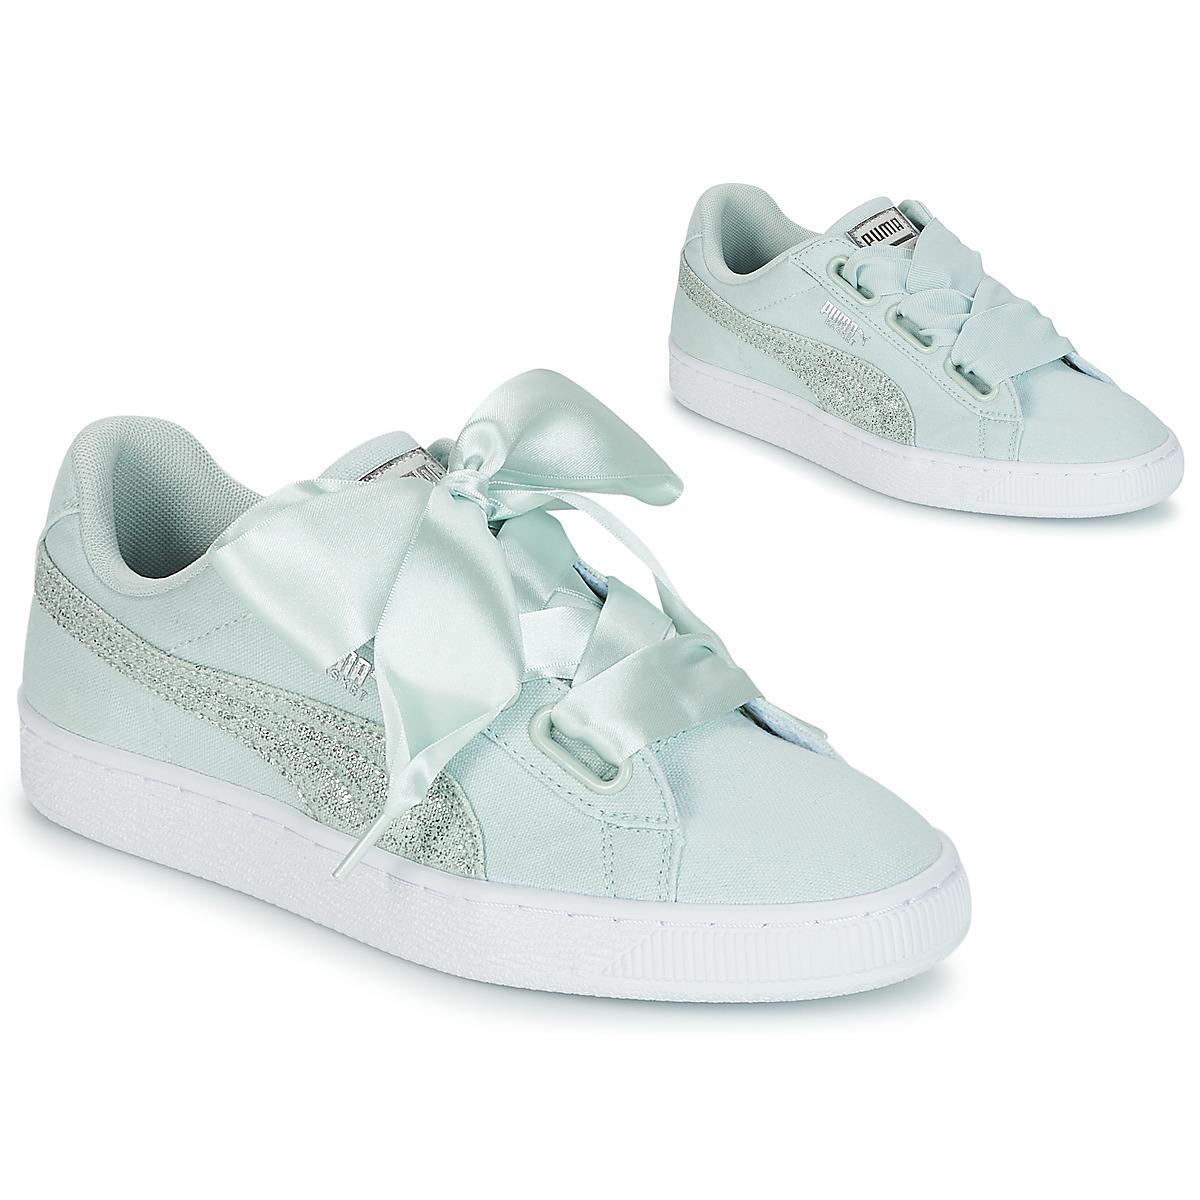 PUMA - Basket Heart Canvas W s Women s Shoes (trainers) In Green - Lyst.  View fullscreen fef92e01f